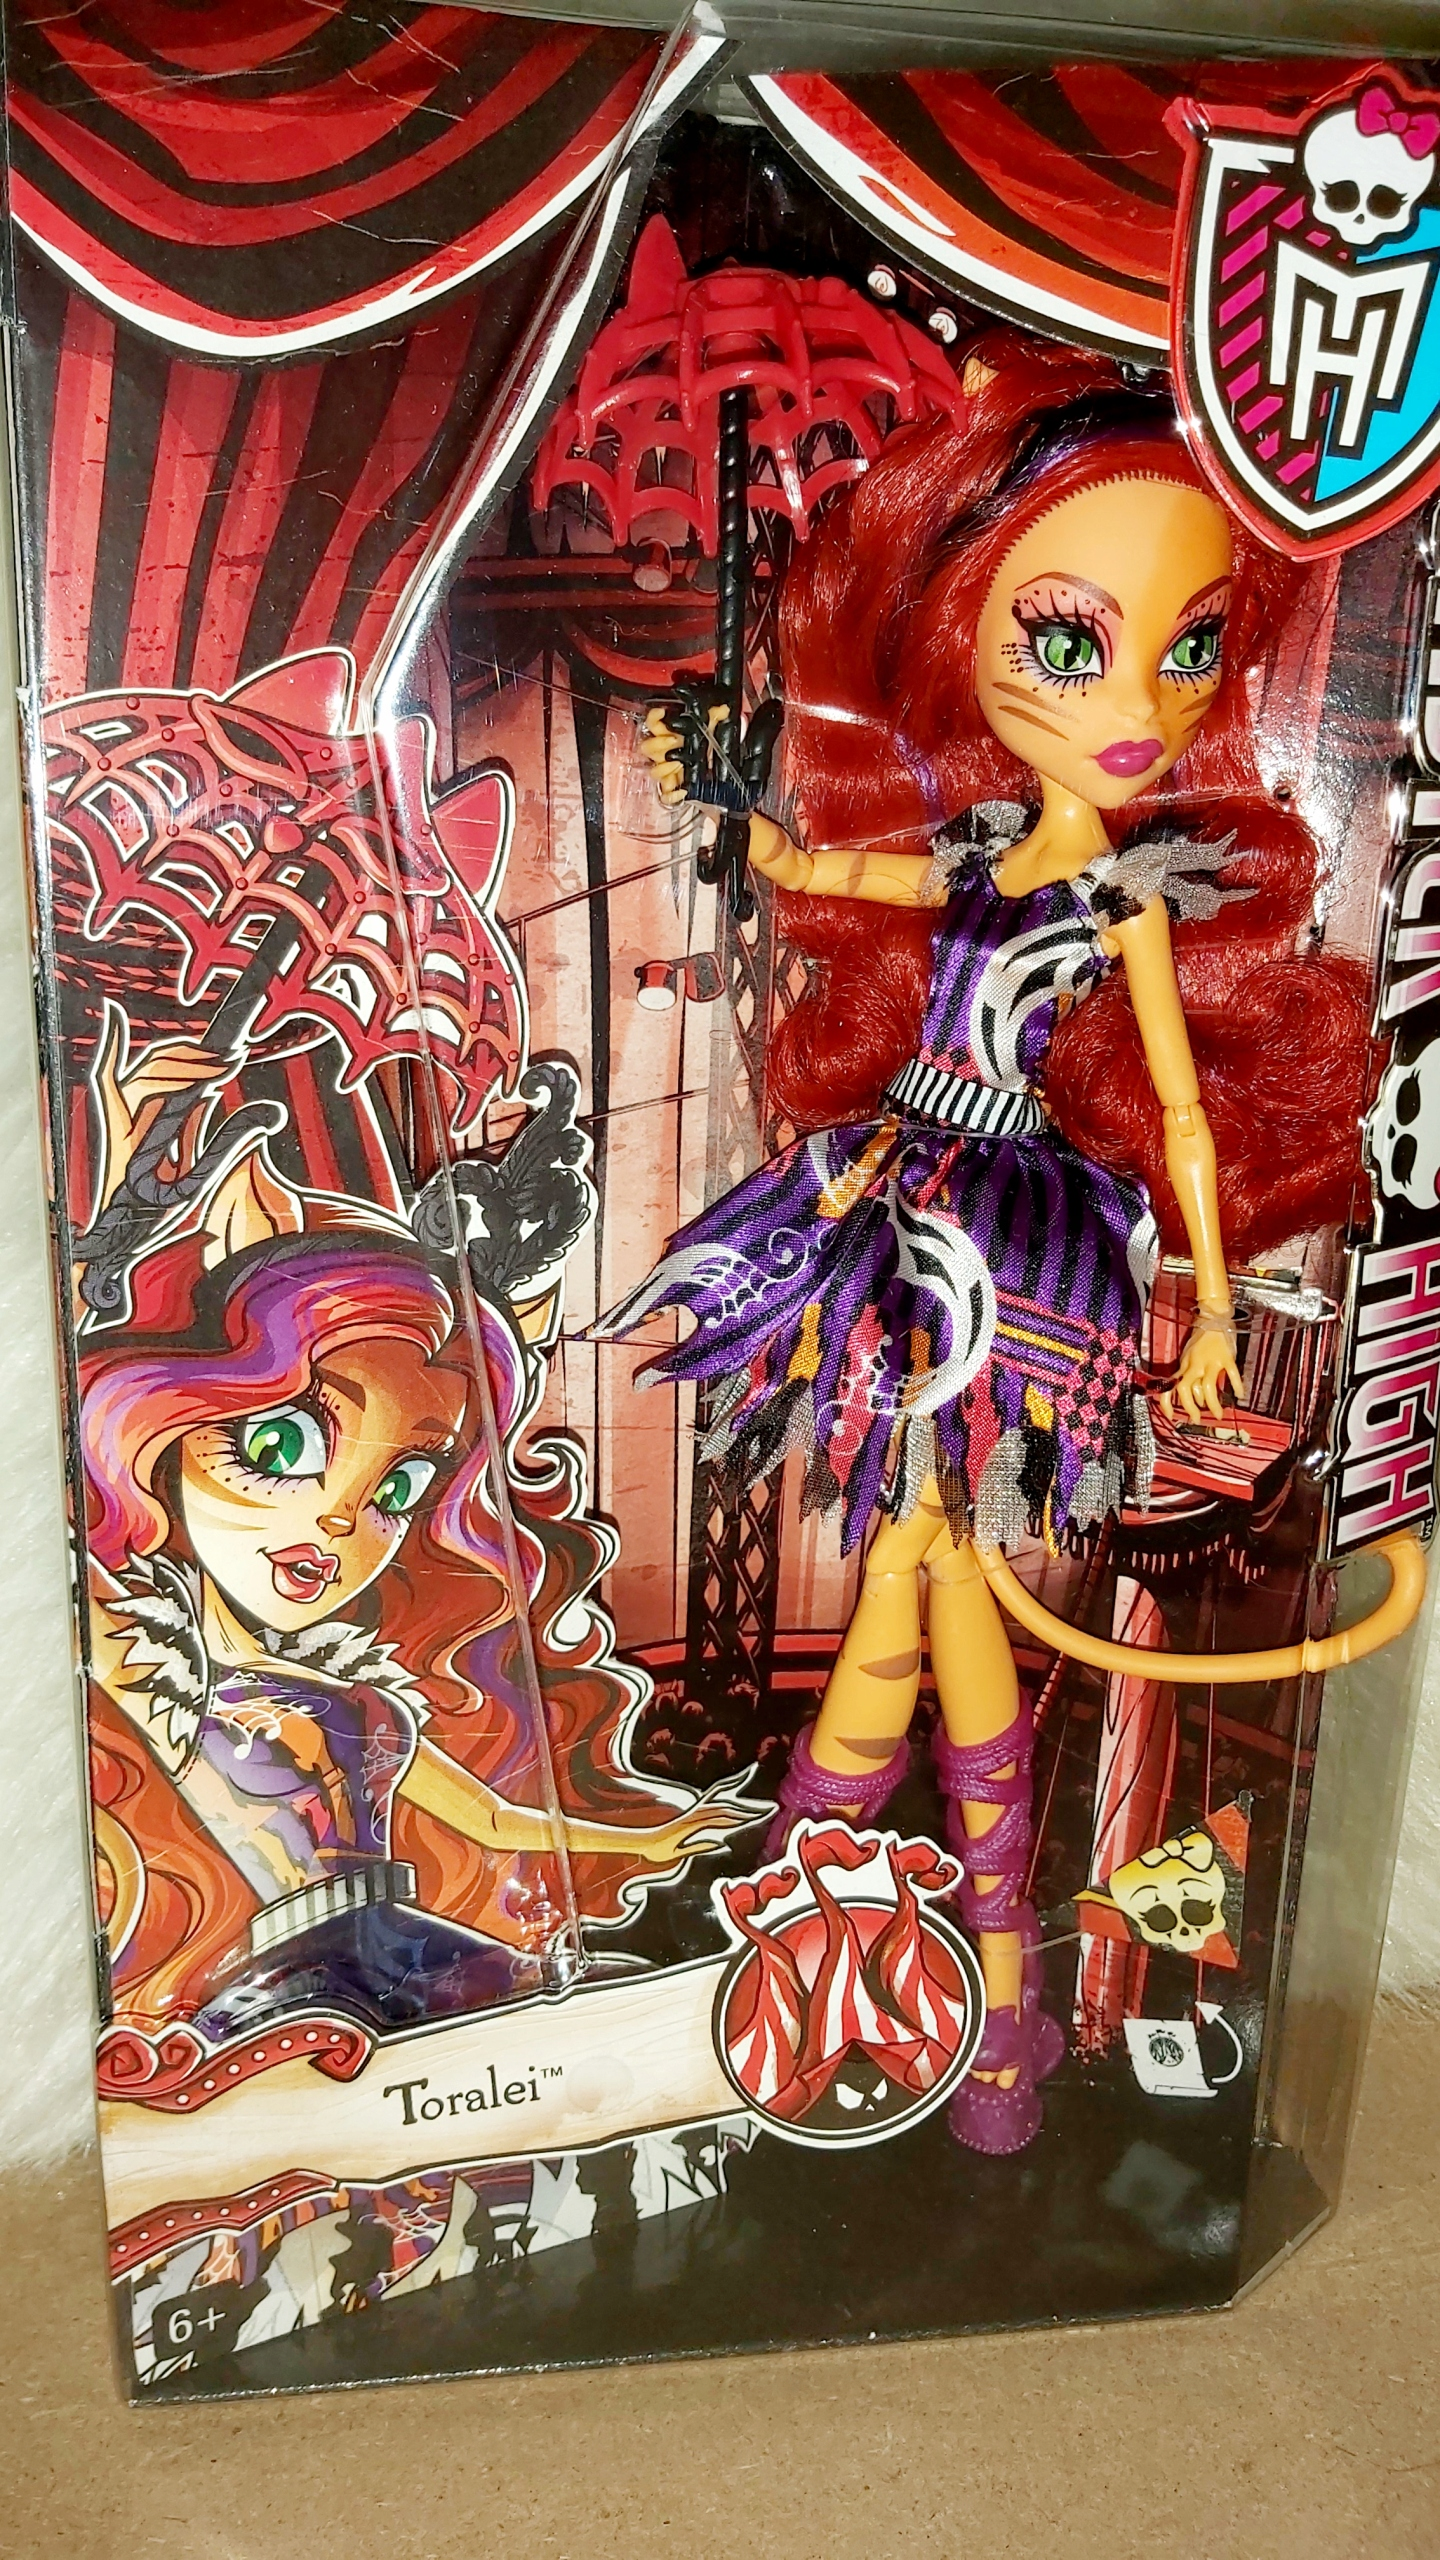 Prúžok Monster High Cyrk de Chic Toralei